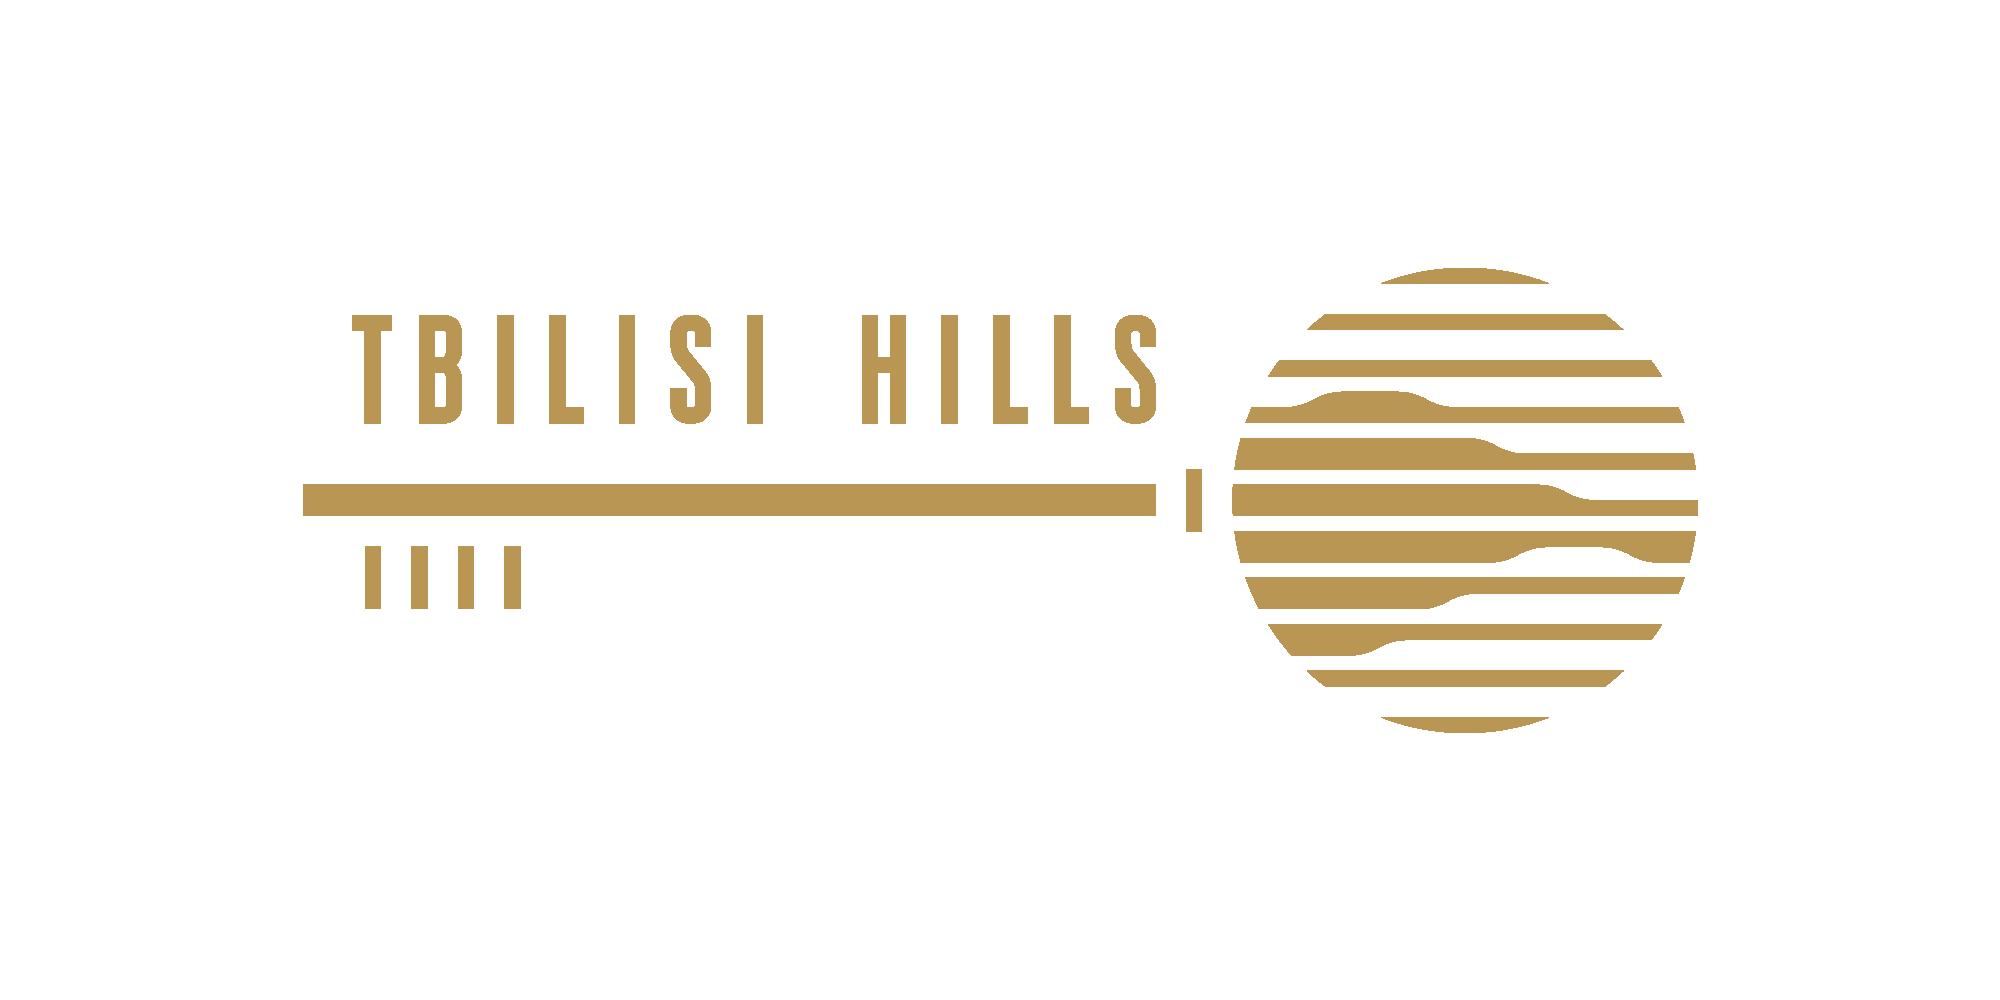 Tibilisi_logo